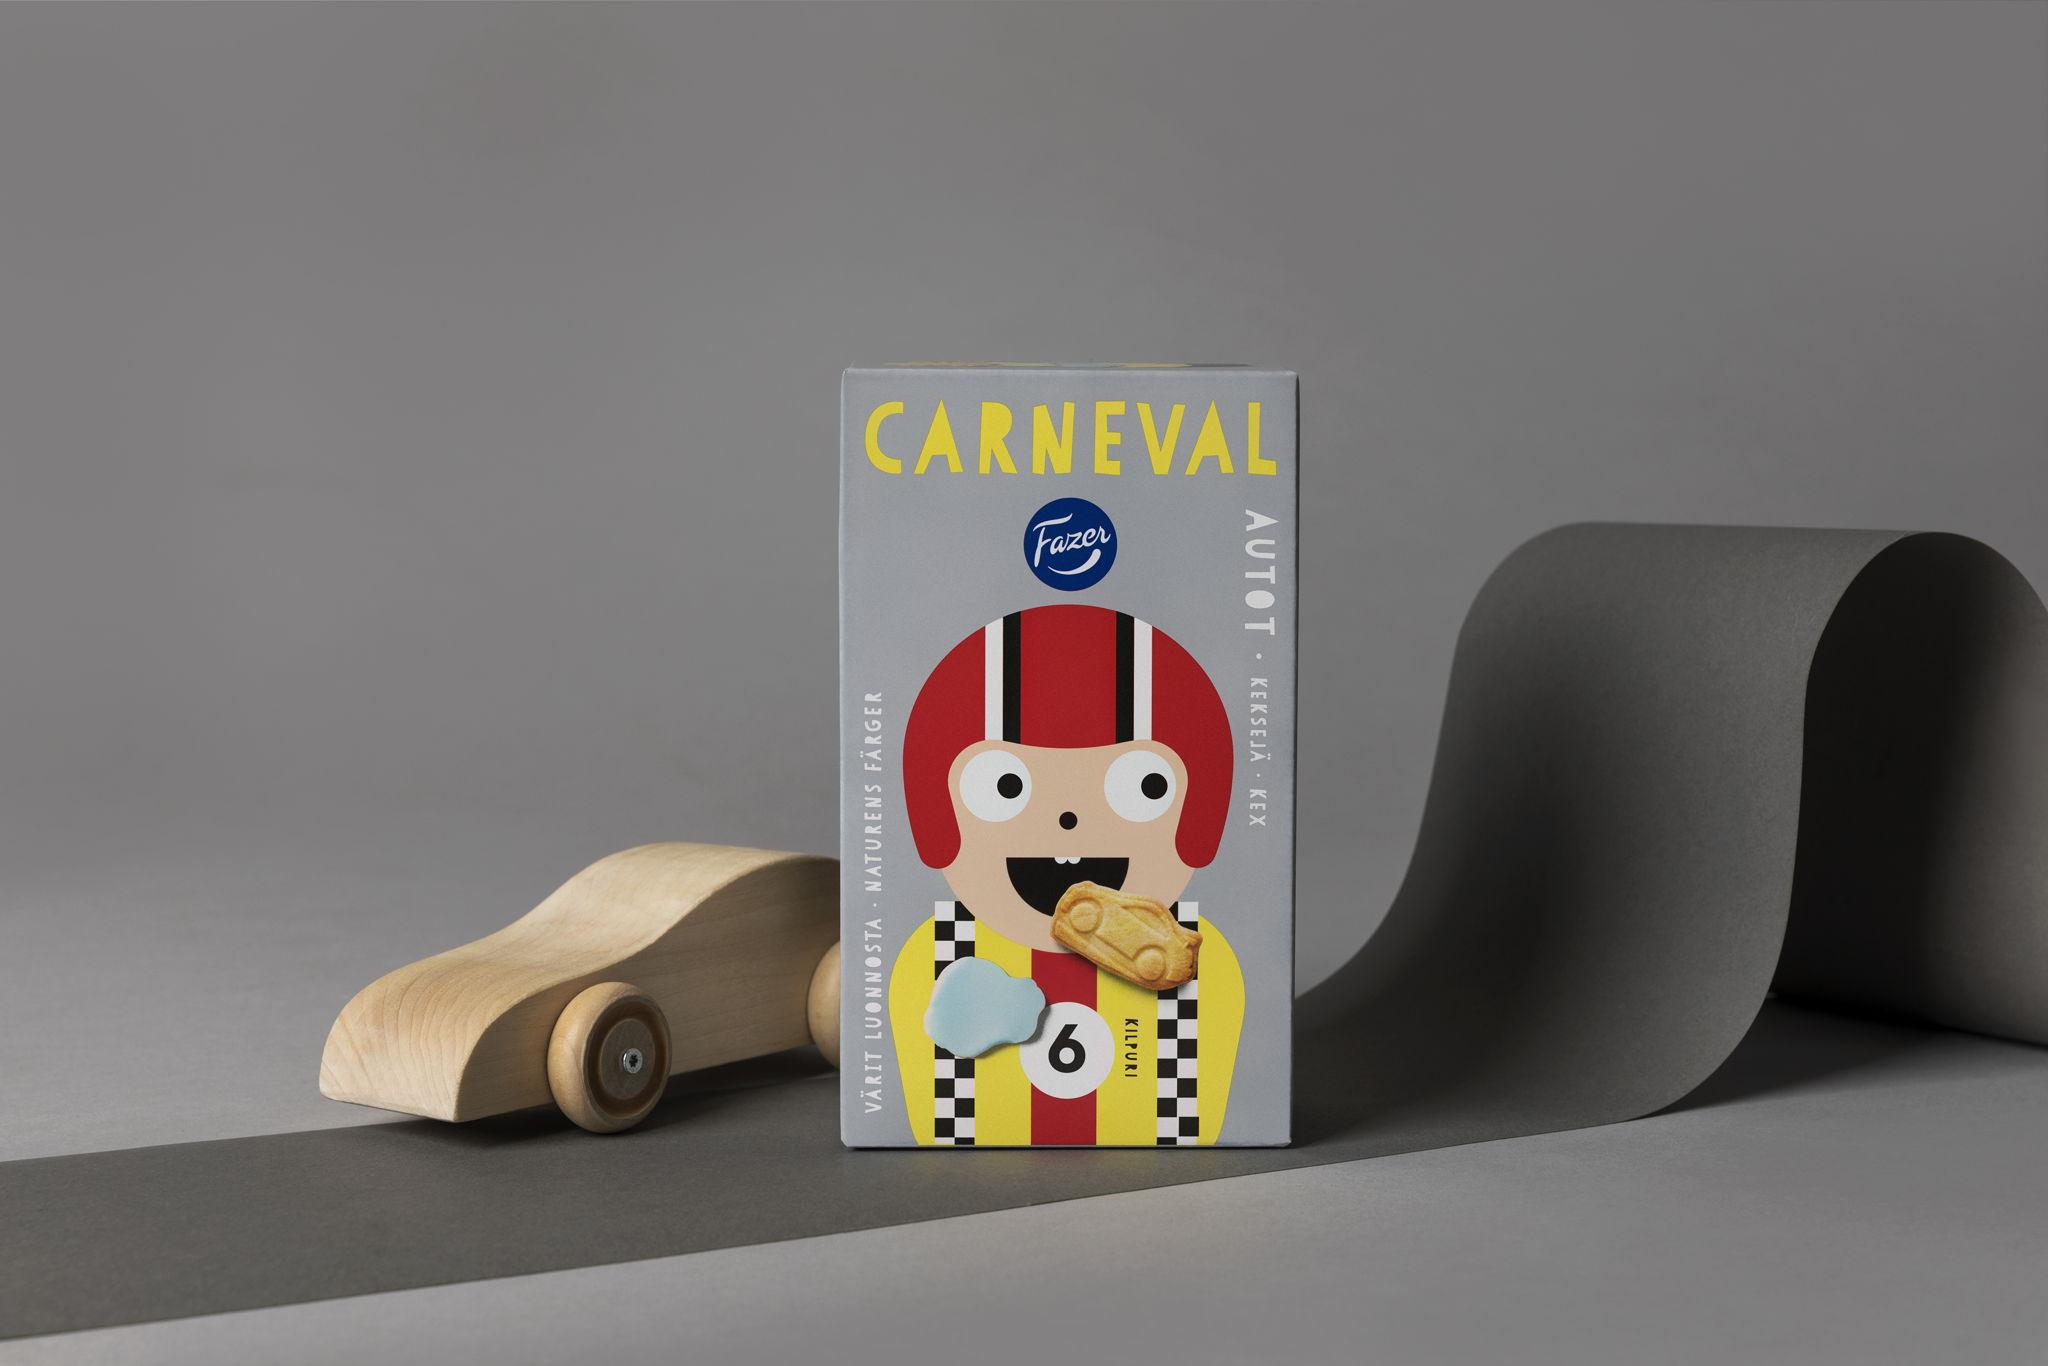 3_Kuudes_Carneval_Cars.jpg